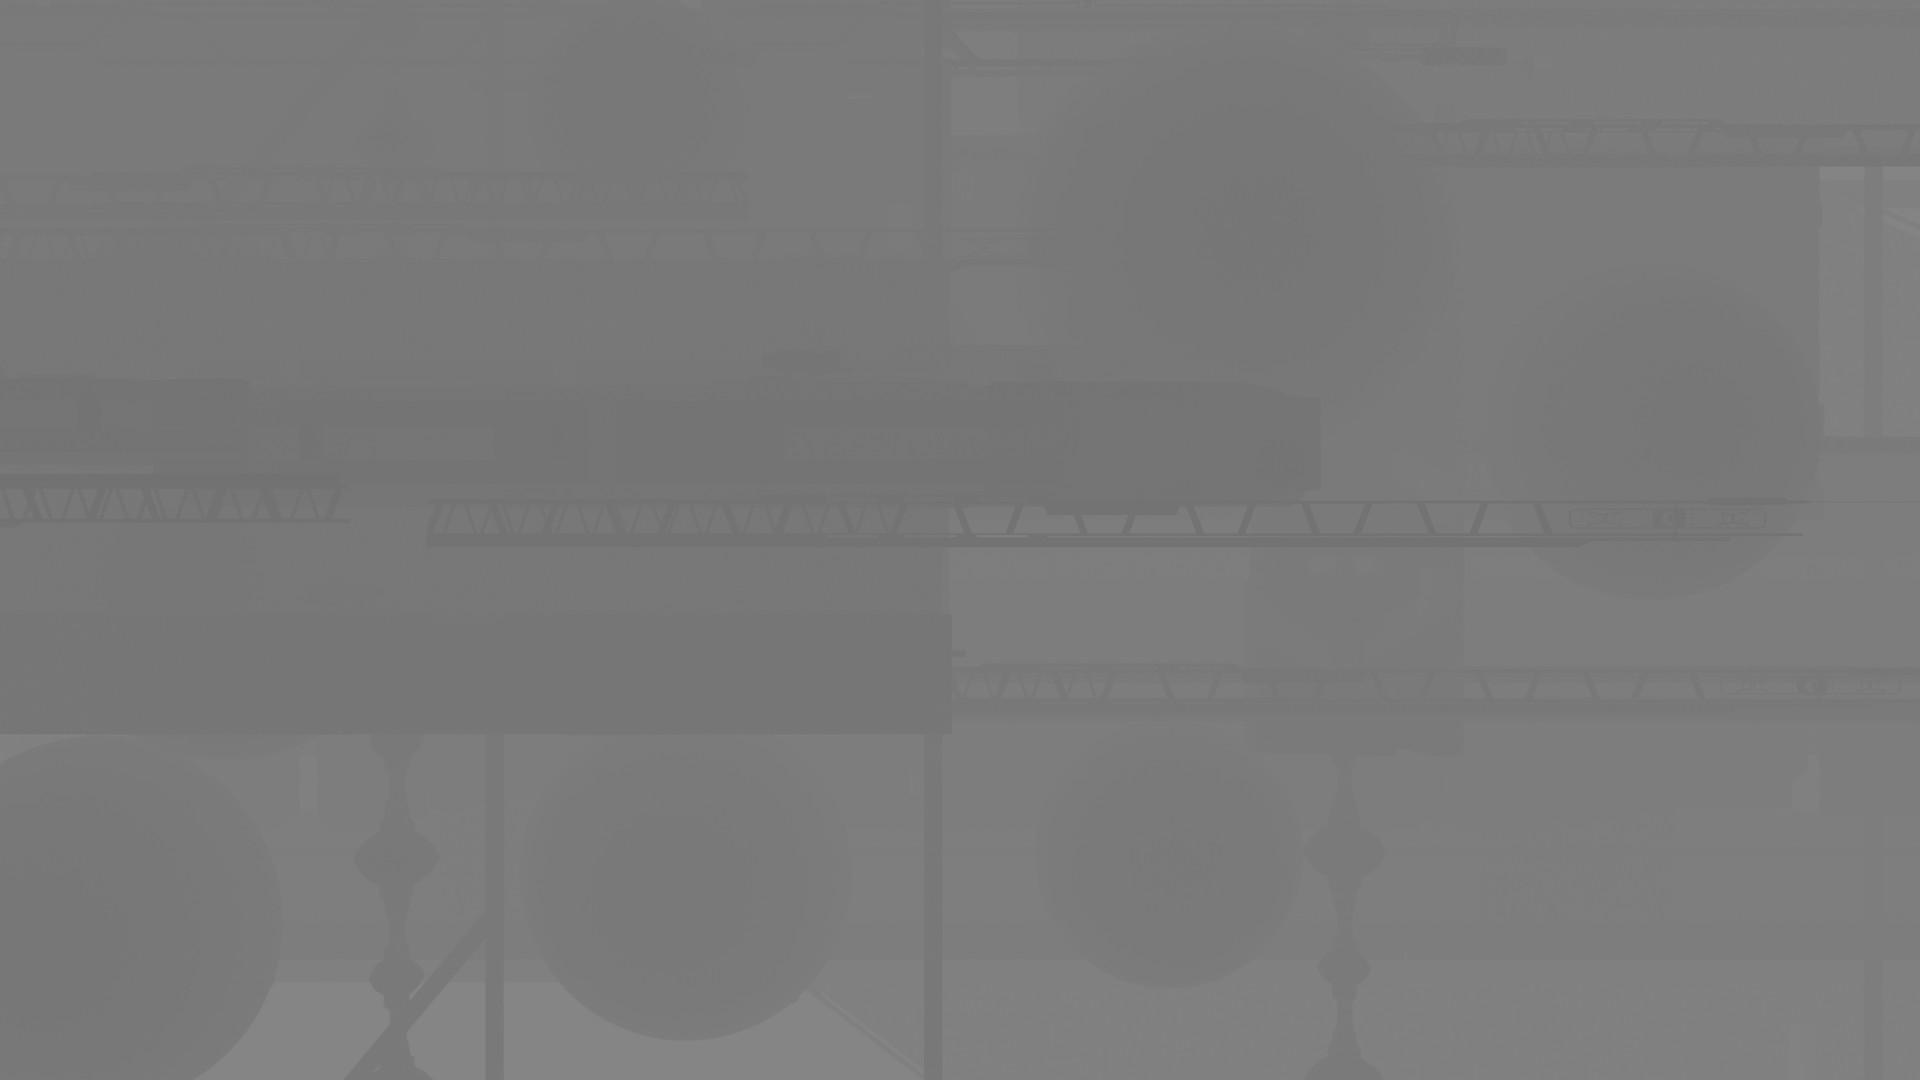 Kresimir jelusic robob3ar 255 240616 z